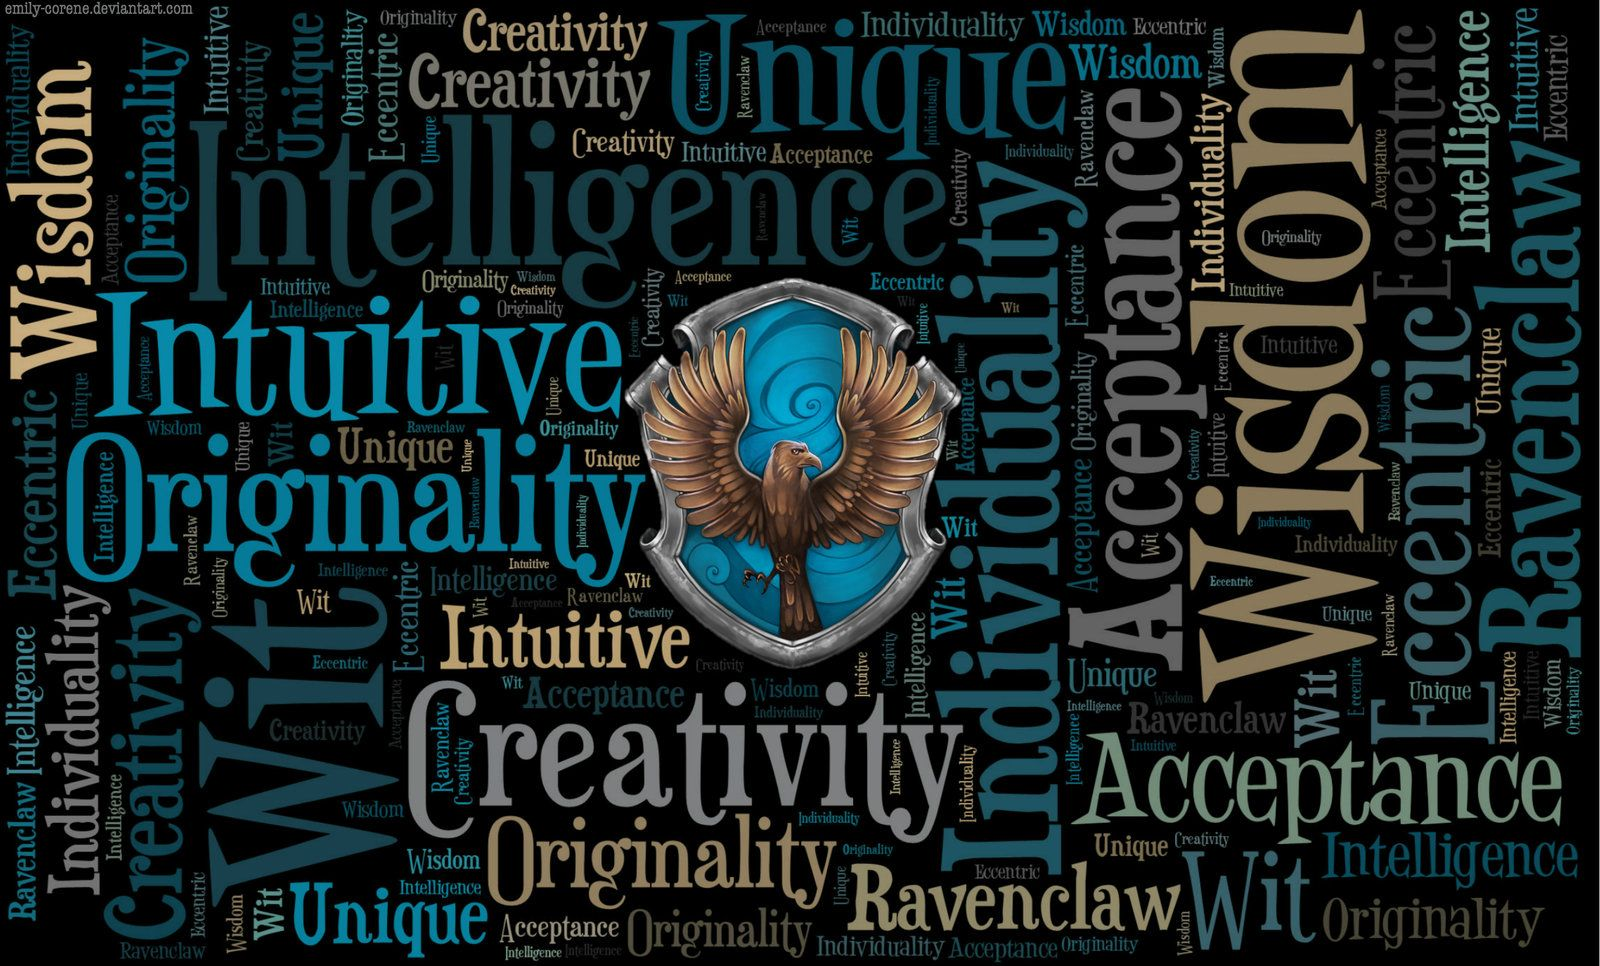 Hd Ravenclaw Traits Wallpaper By Emily Coreneviantart On Deviantart